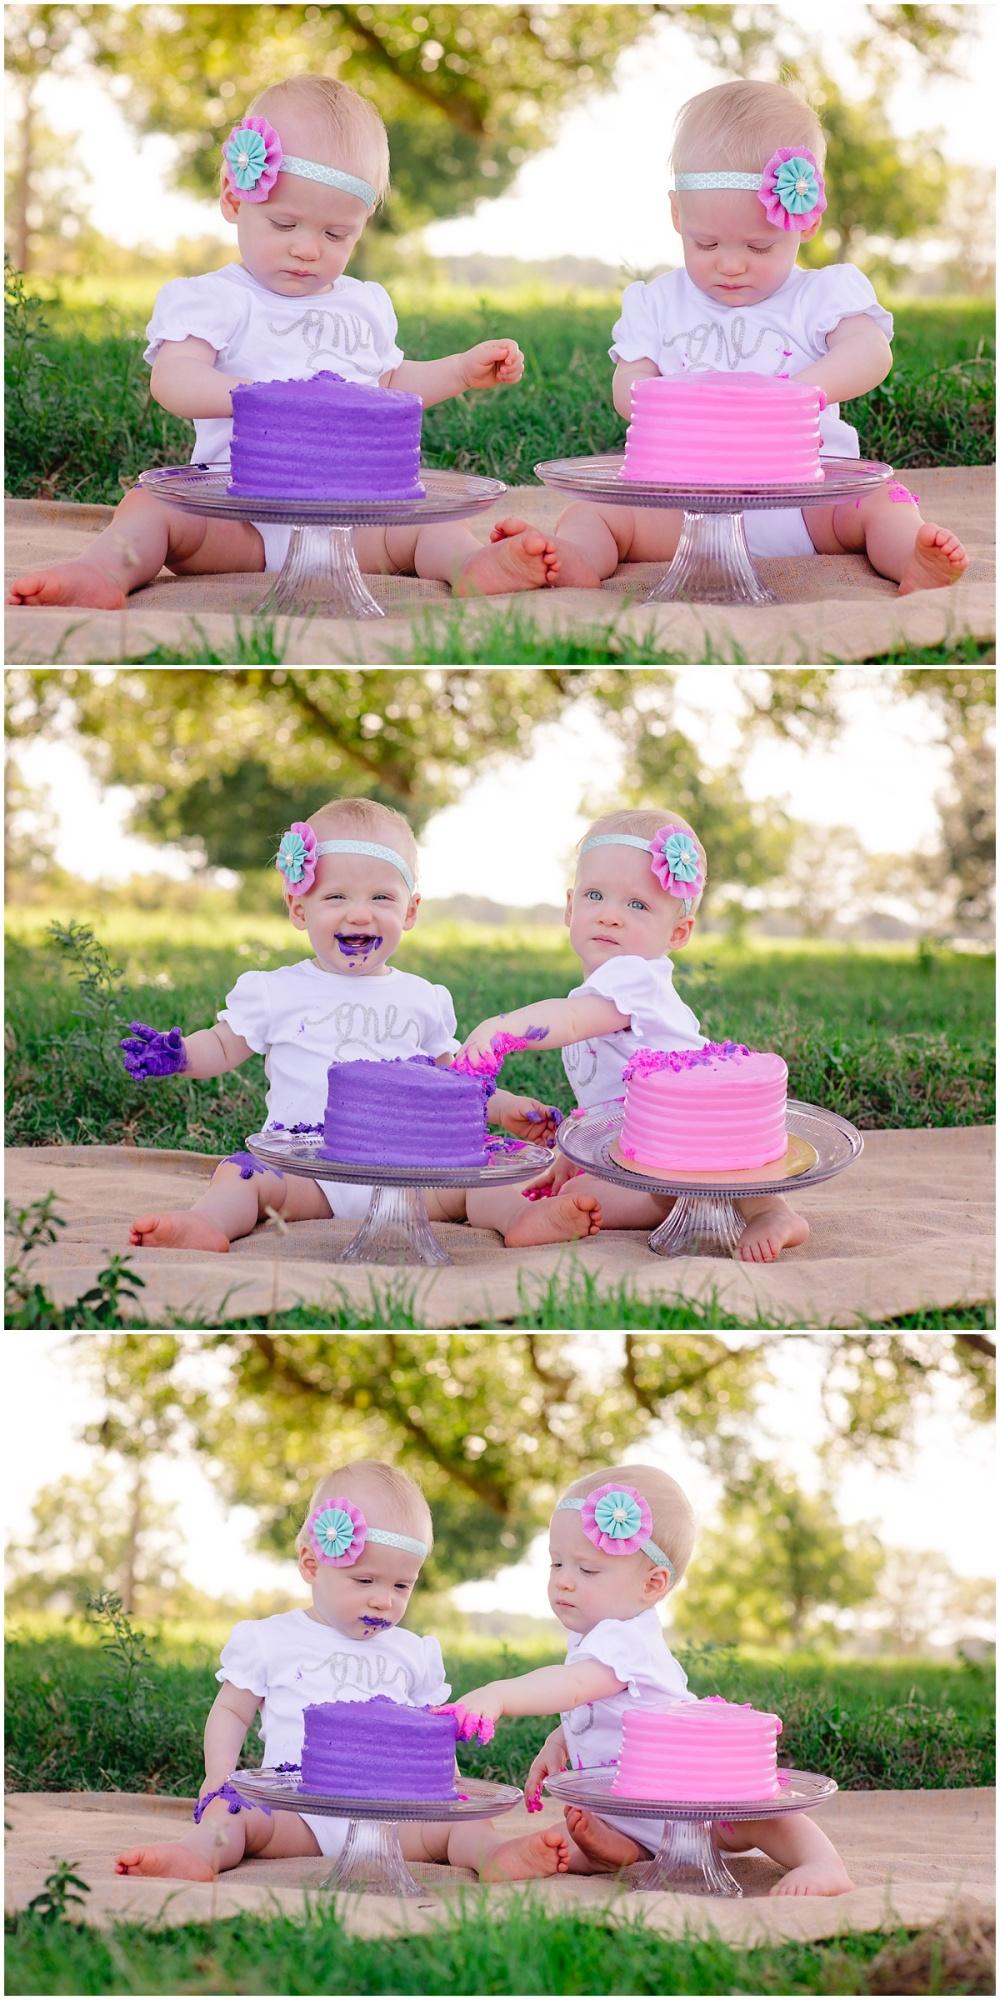 Family-Children-Portraits-Cake-Smash-Photos-San-Antonio-Hill-Country-Texas-Carly-Barton-Photography_0014.jpg